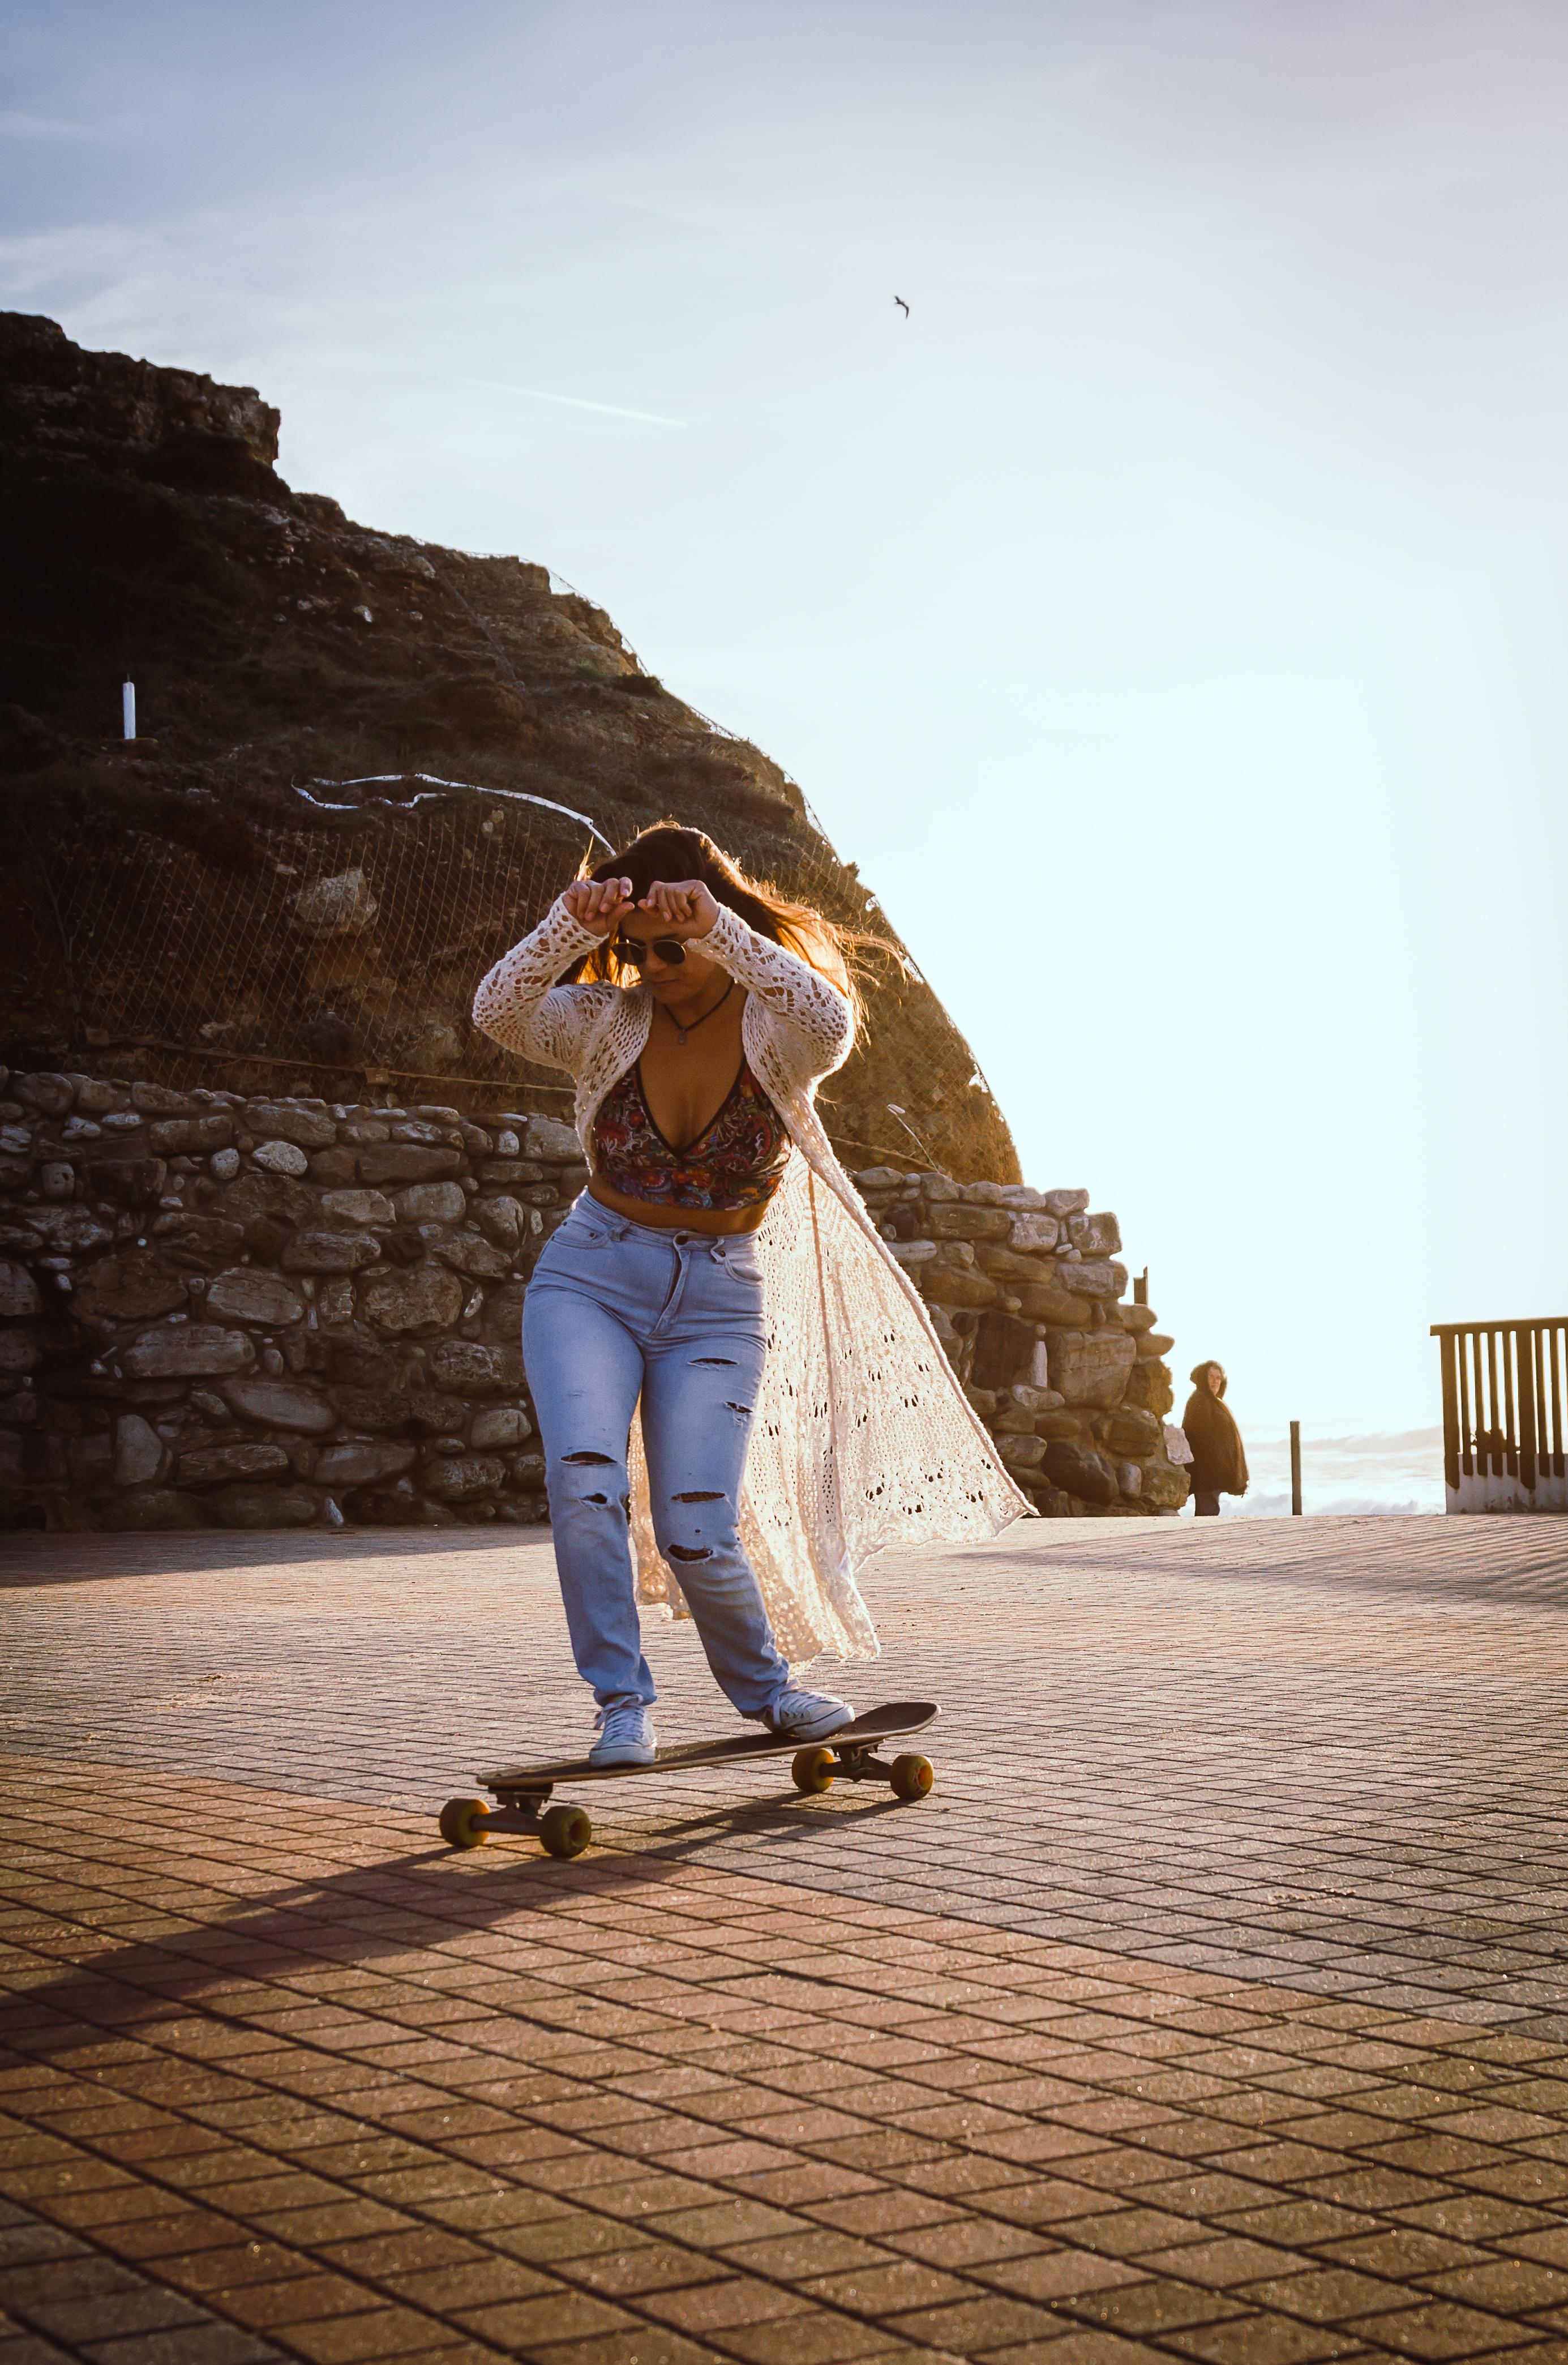 Skaterboarder female portrait